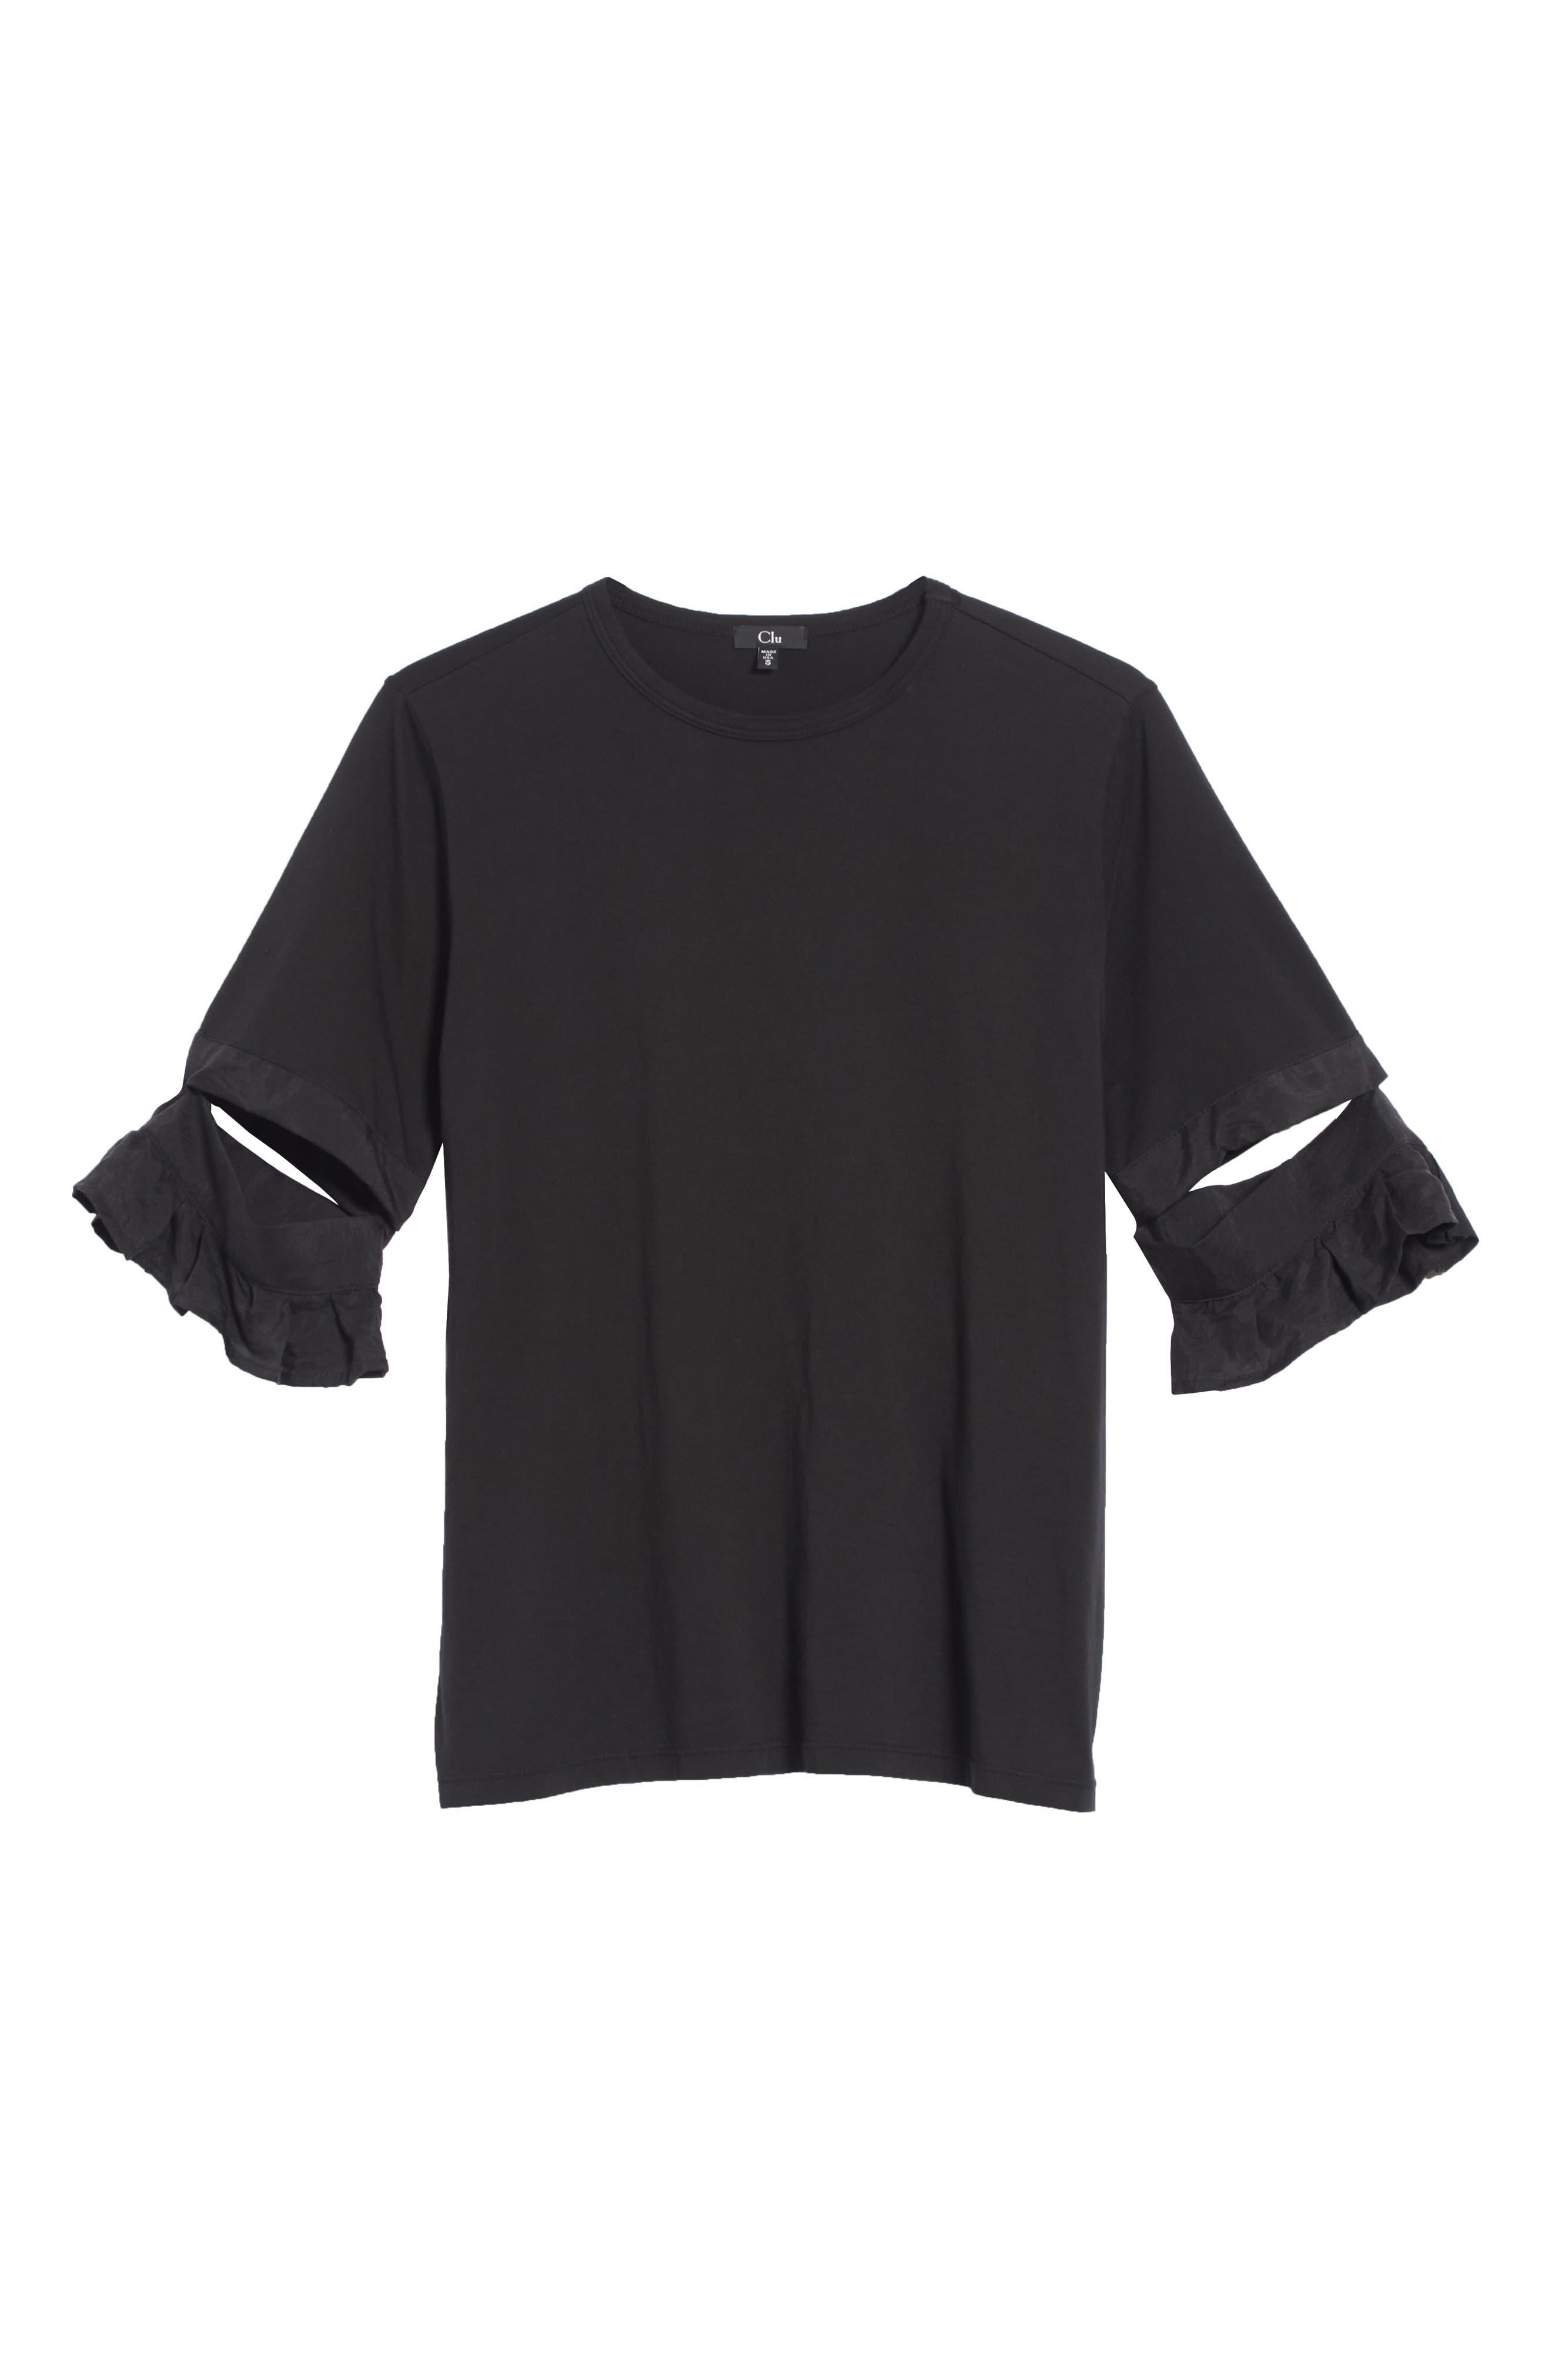 Open Sleeve Top,                             Alternate thumbnail 5, color,                             Black